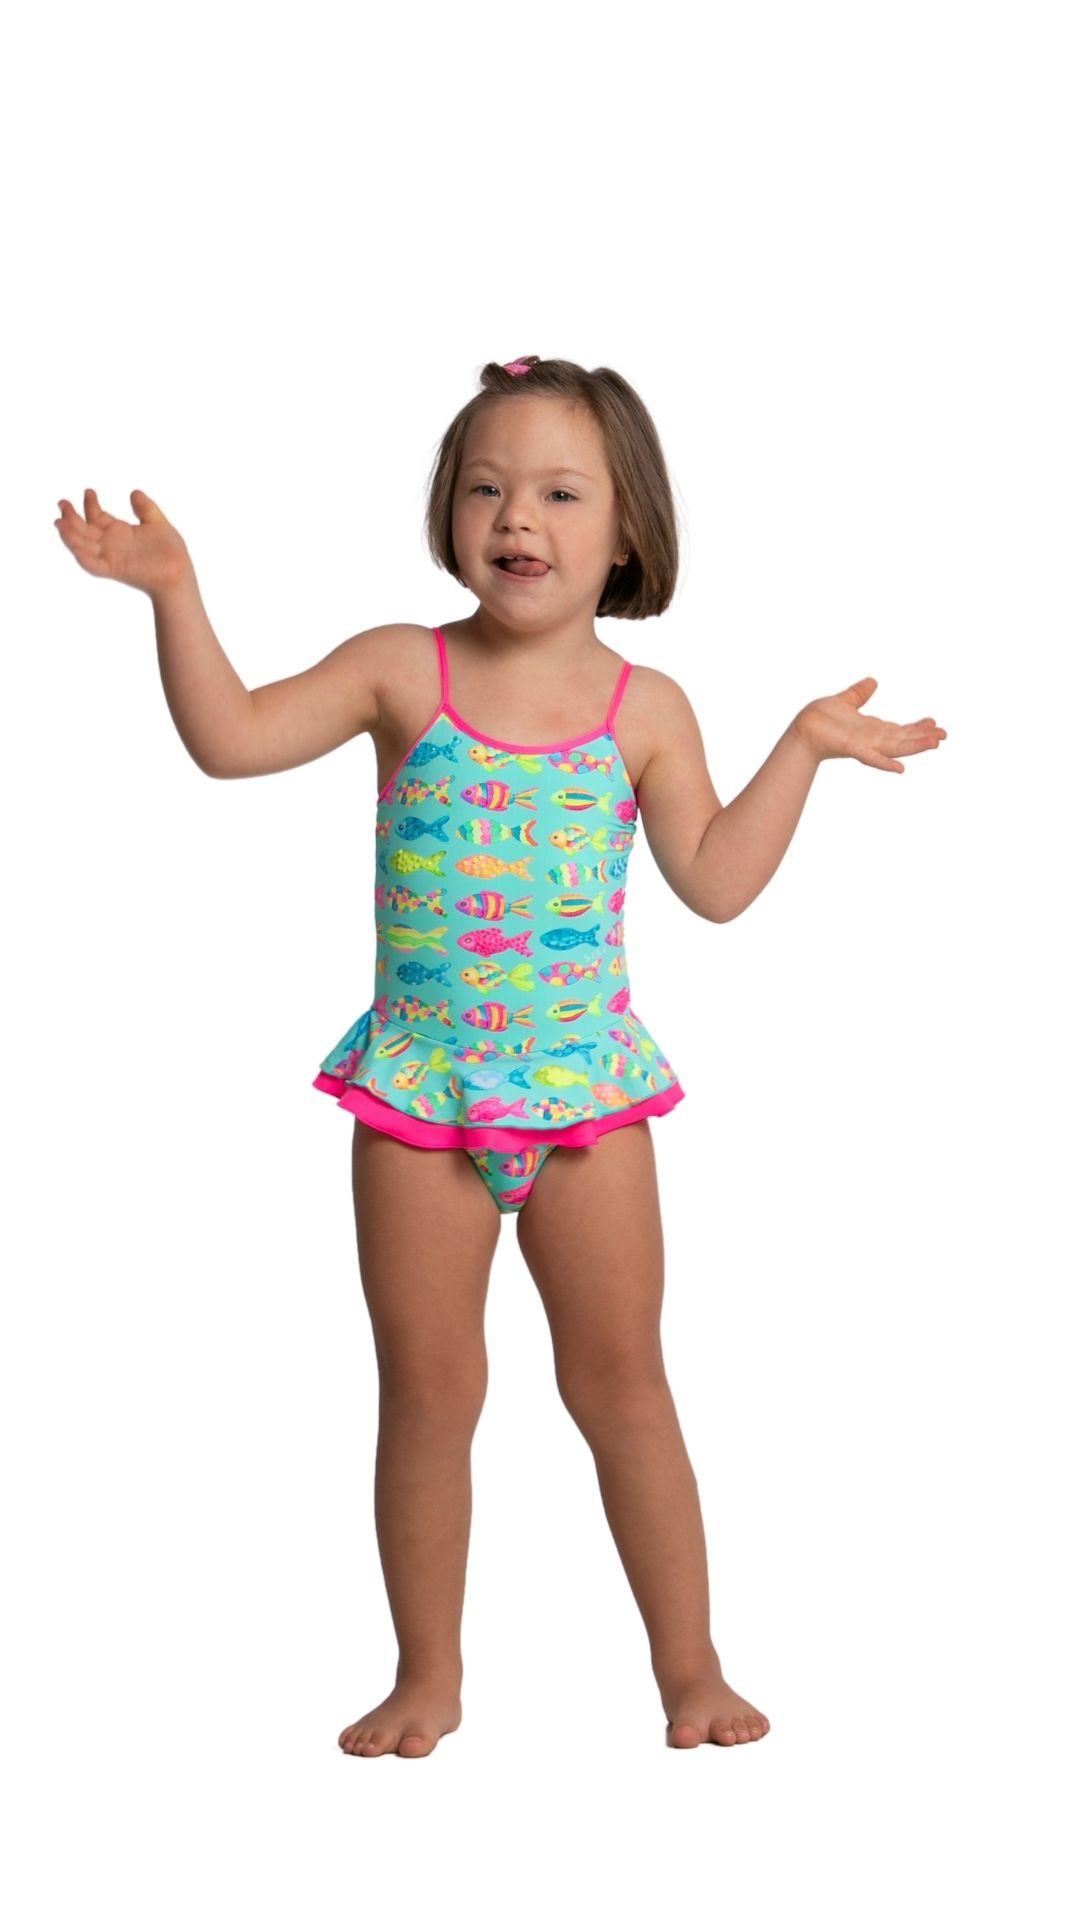 Maio Peixinhos Siri Kids Infantil